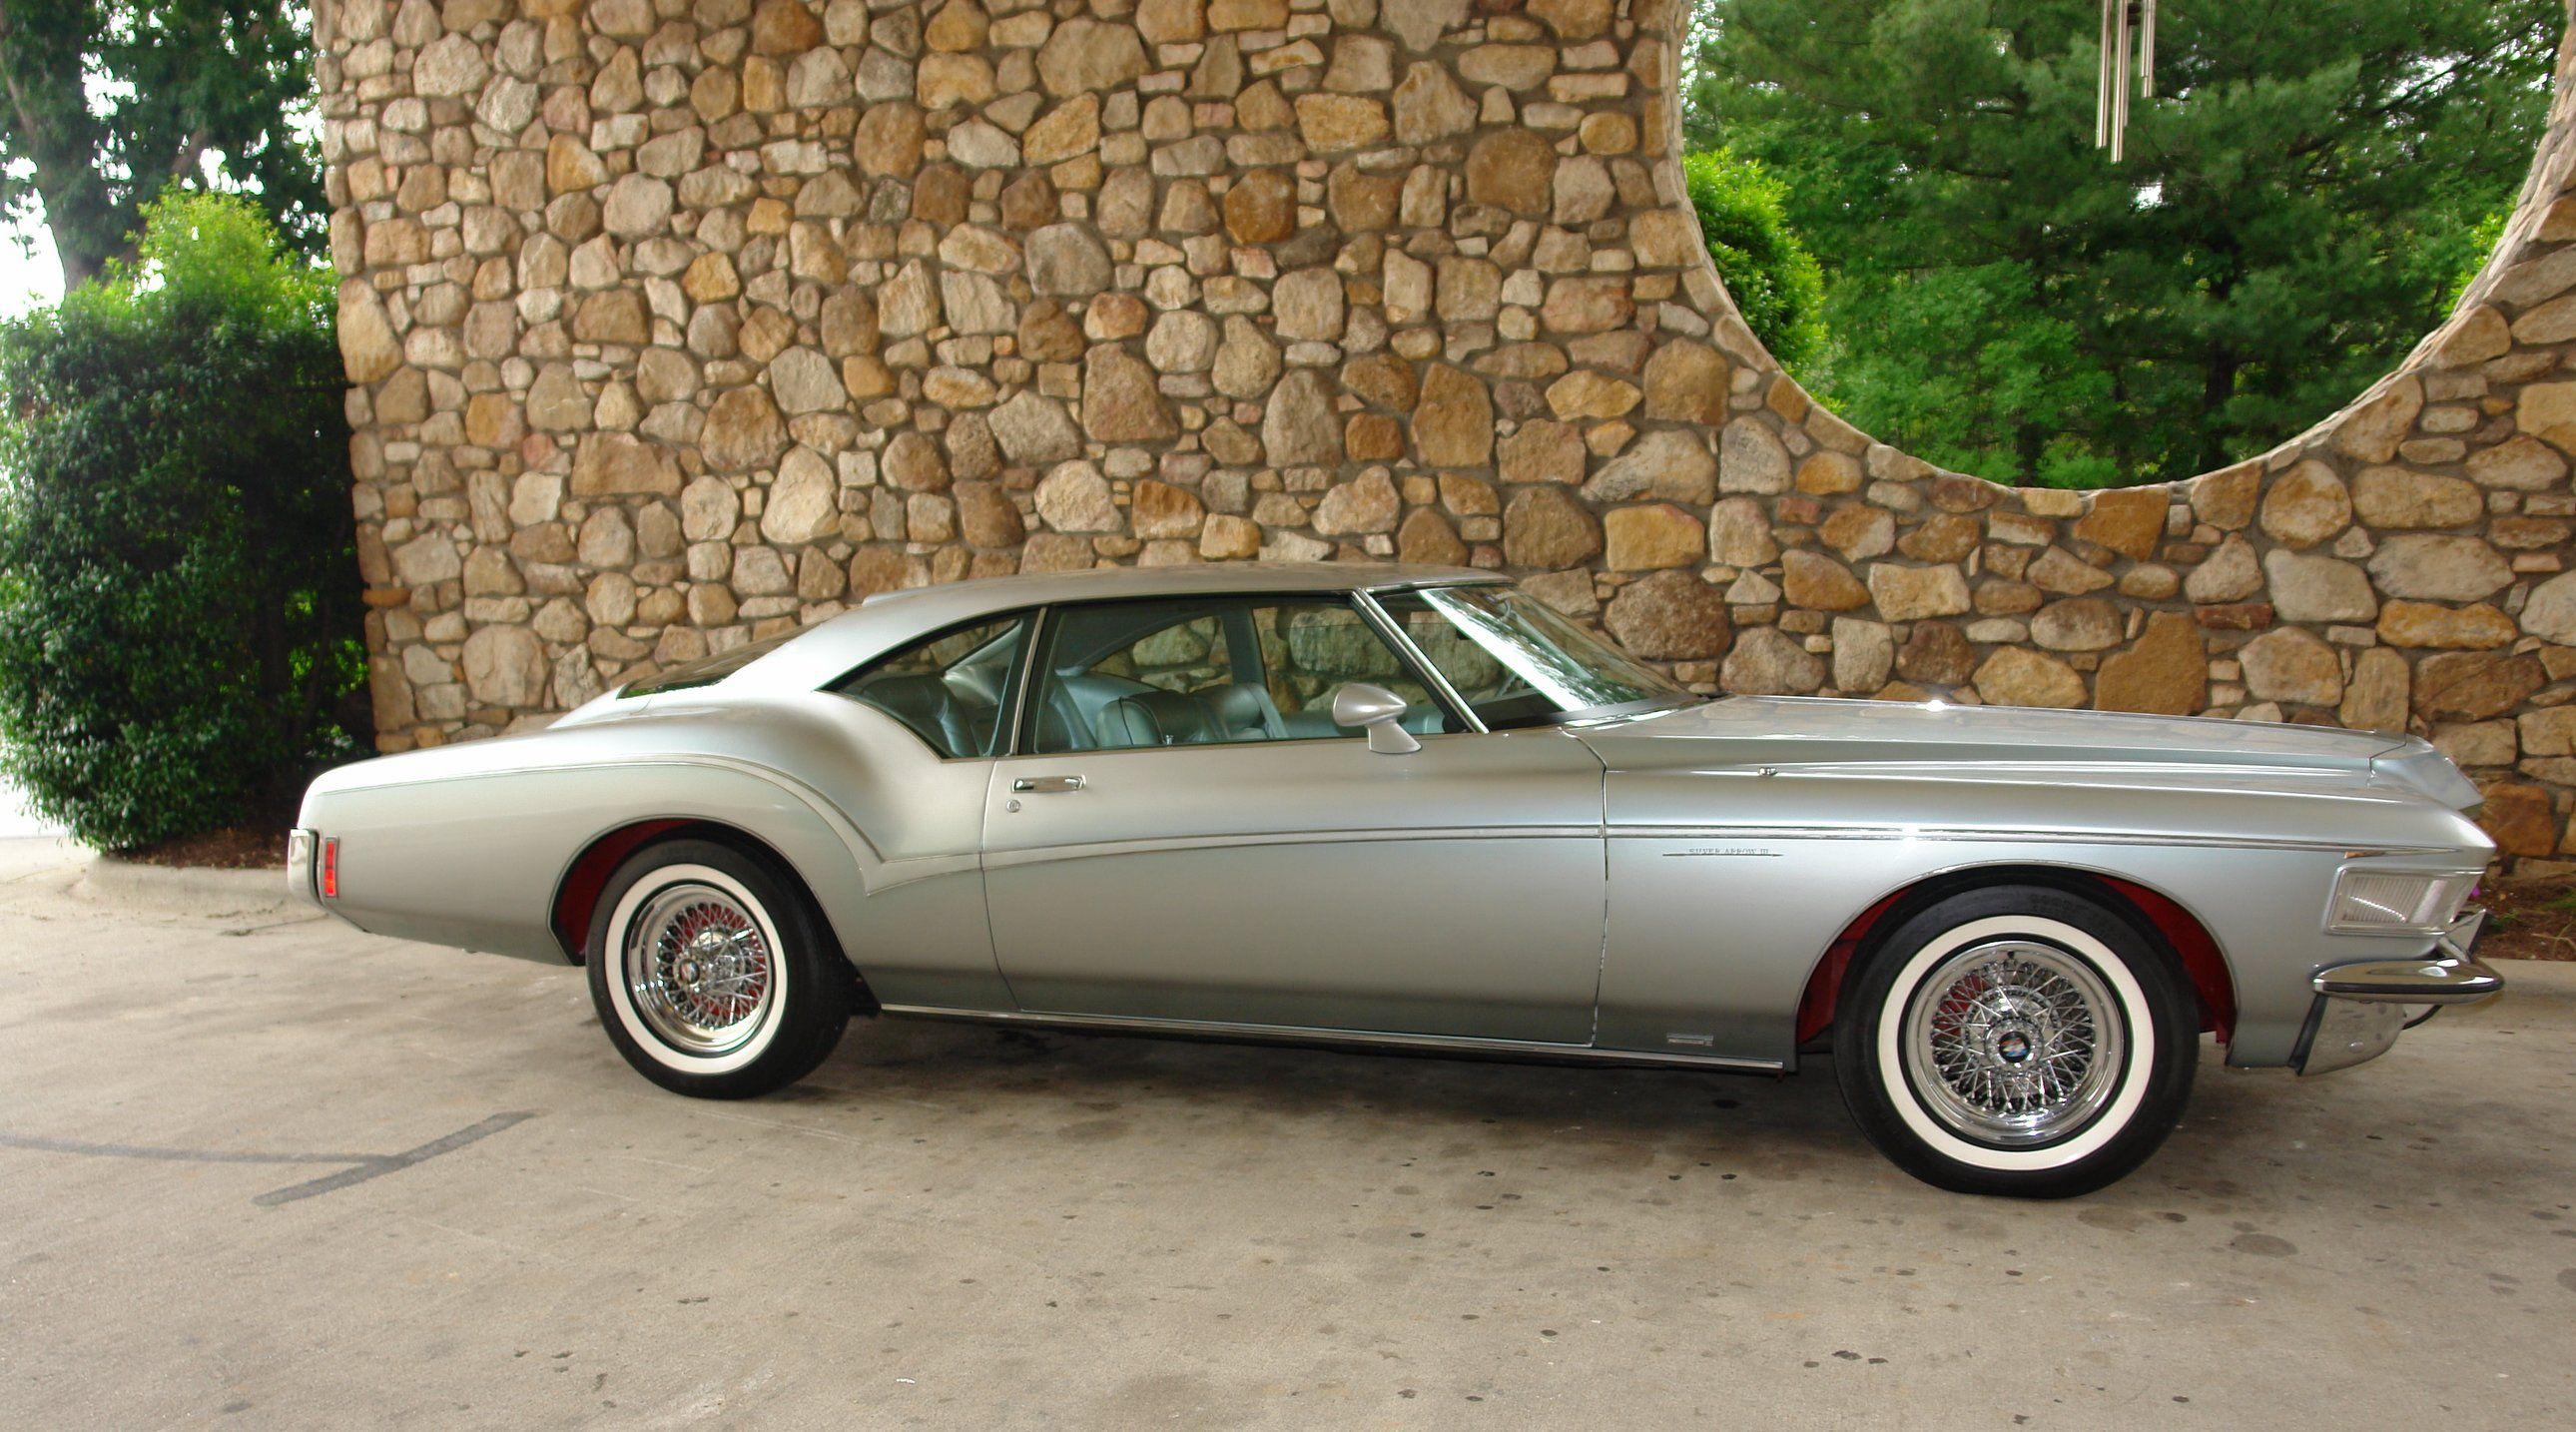 Buick Riviera Silver Arrow show car pinstriping, whitewalls, and ...